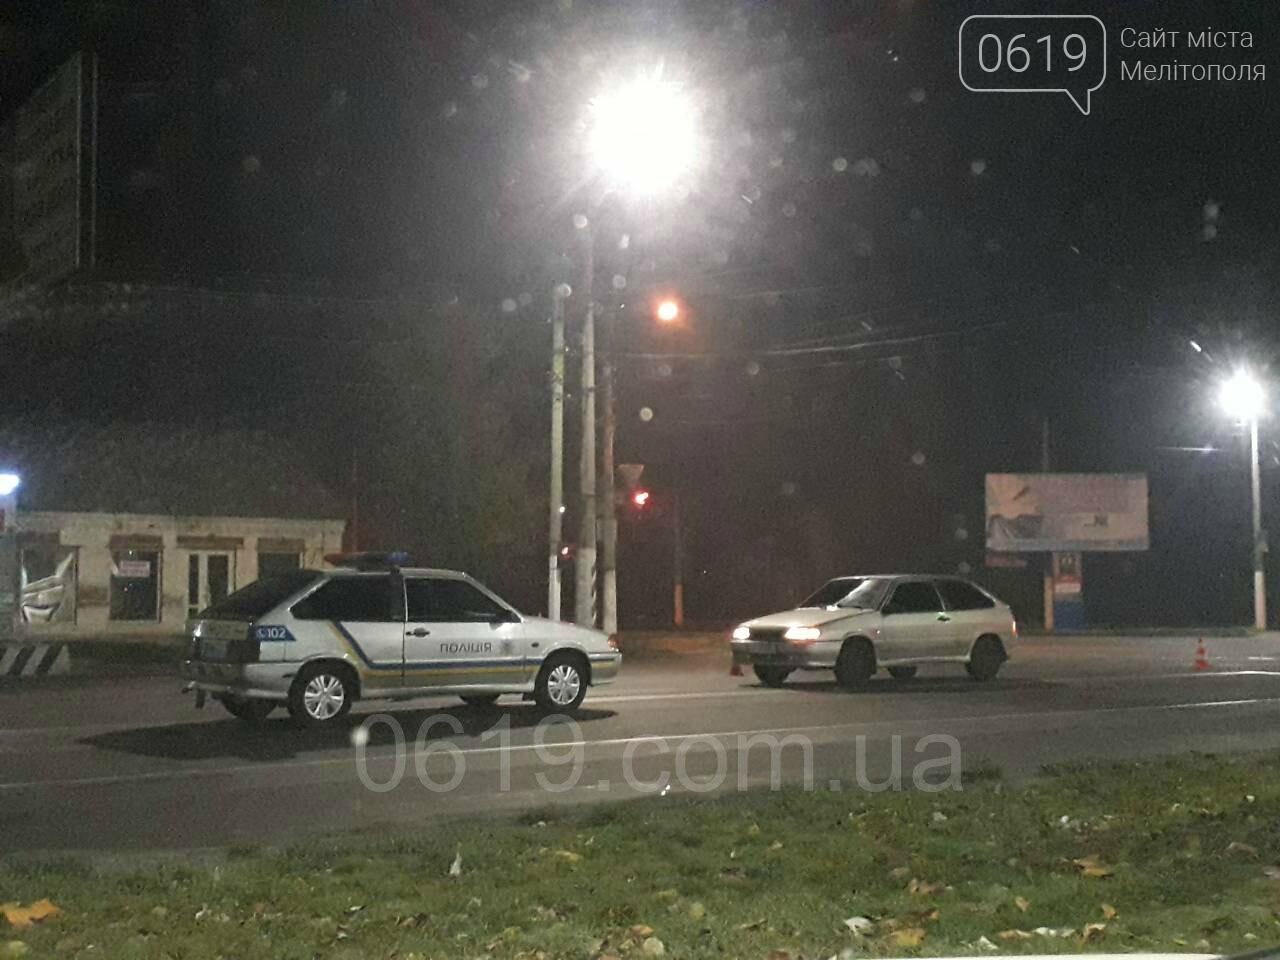 В Мелитополе на пешеходном переходе сбили человека, - ФОТО, фото-1